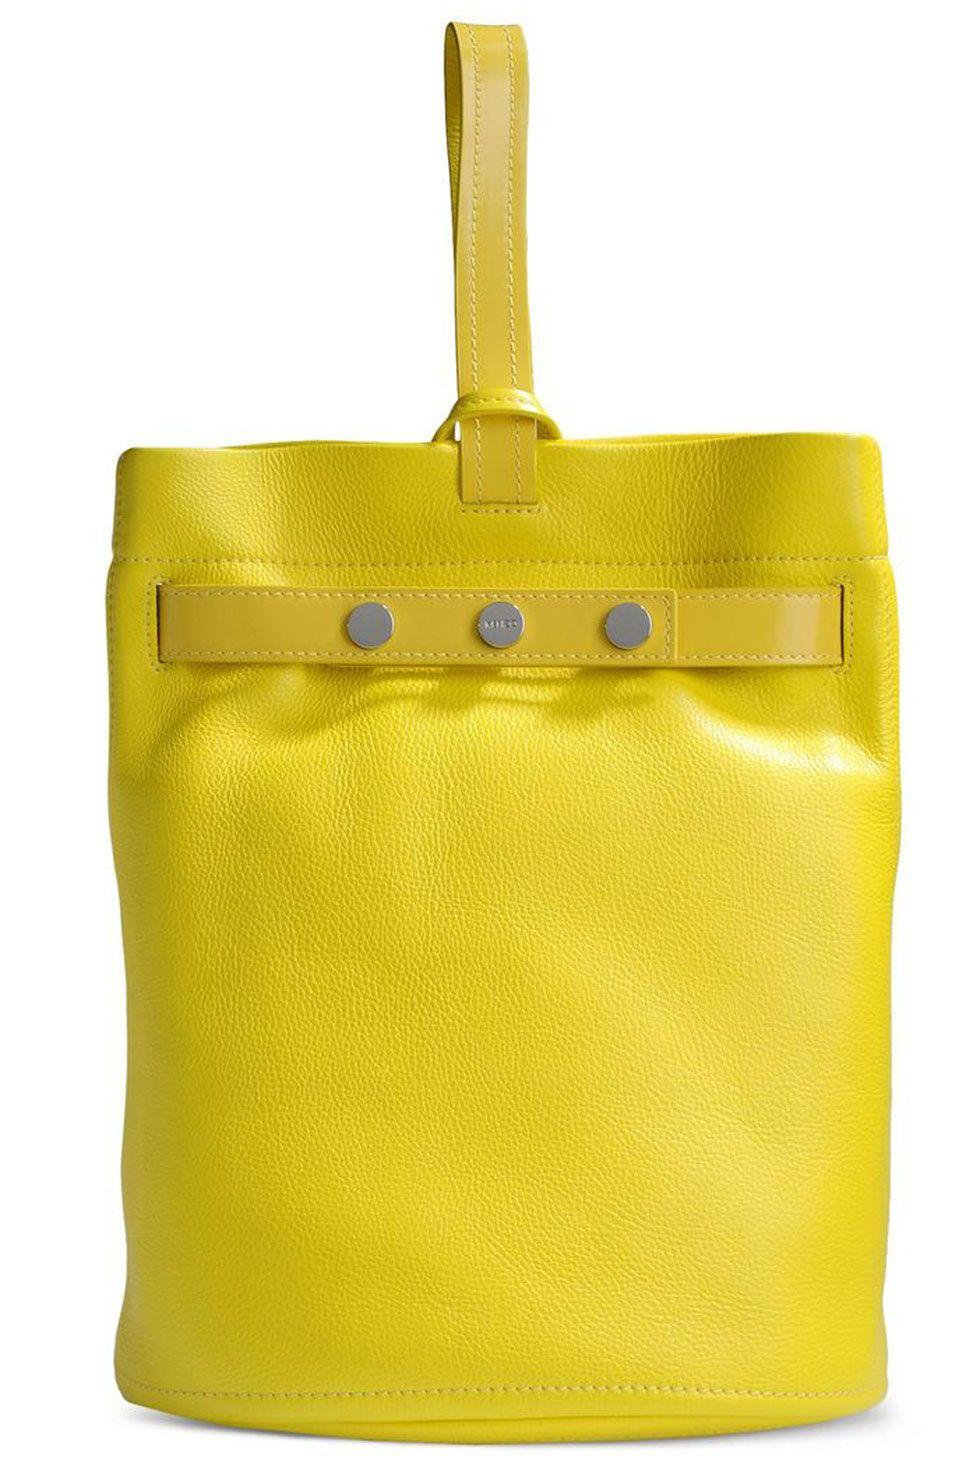 "<p> <strong>Kenzo </strong>bag, $955, <strong><a href=""https://shop.harpersbazaar.com/designers/k/kenzo/kenzo-bag-6078.html"" target=""_blank"">shopBAZAAR.com</a></strong>.</p>"